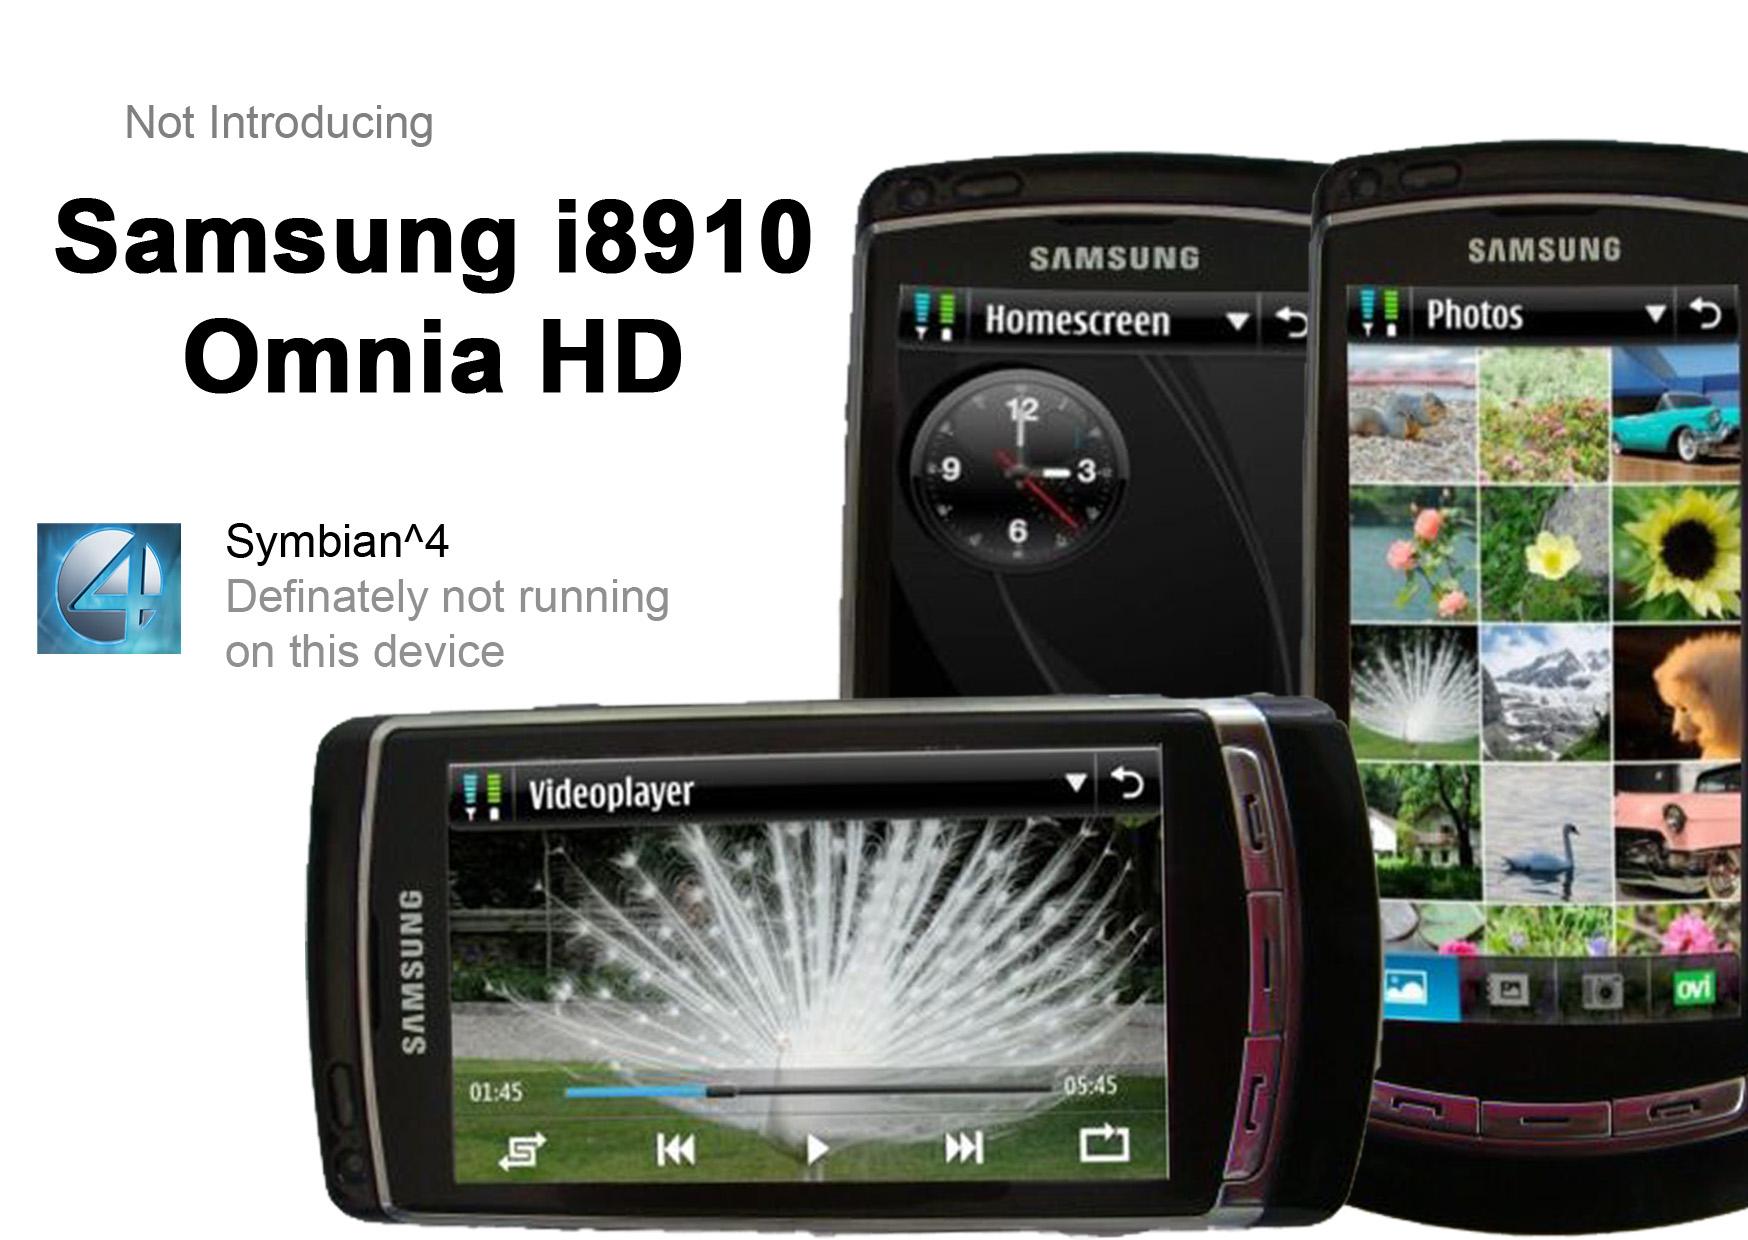 Symbian 4 not happening